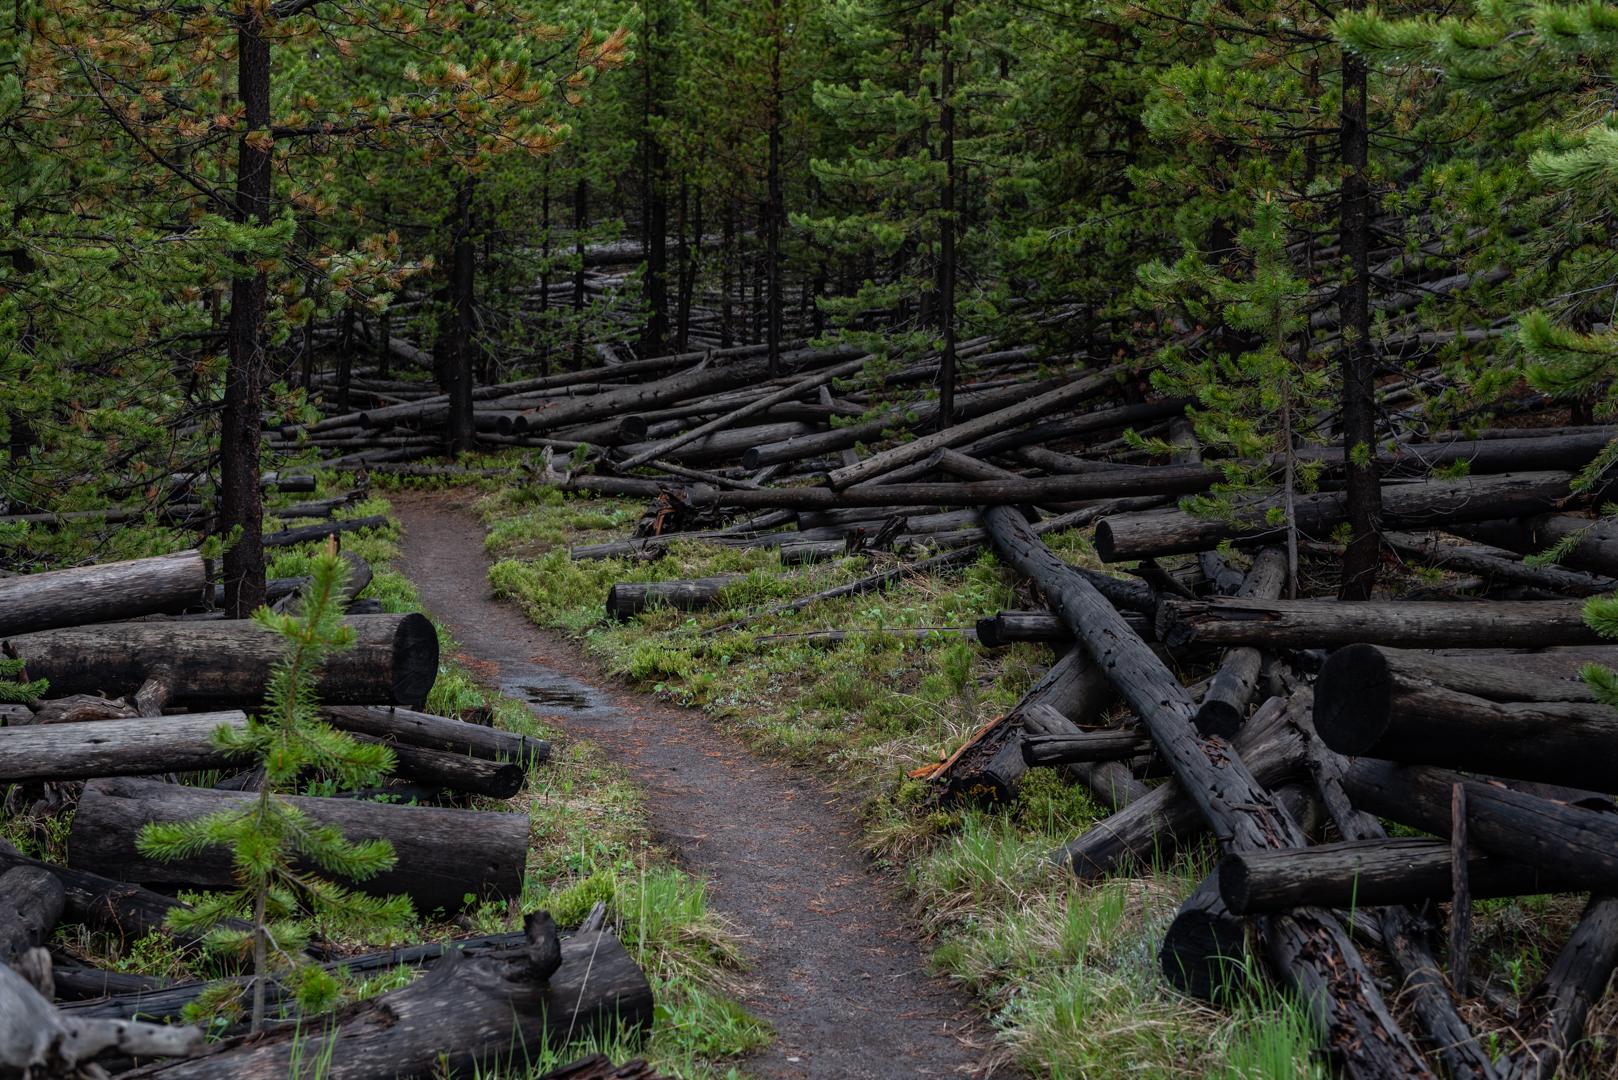 Trail Through Fallen Burned Trees